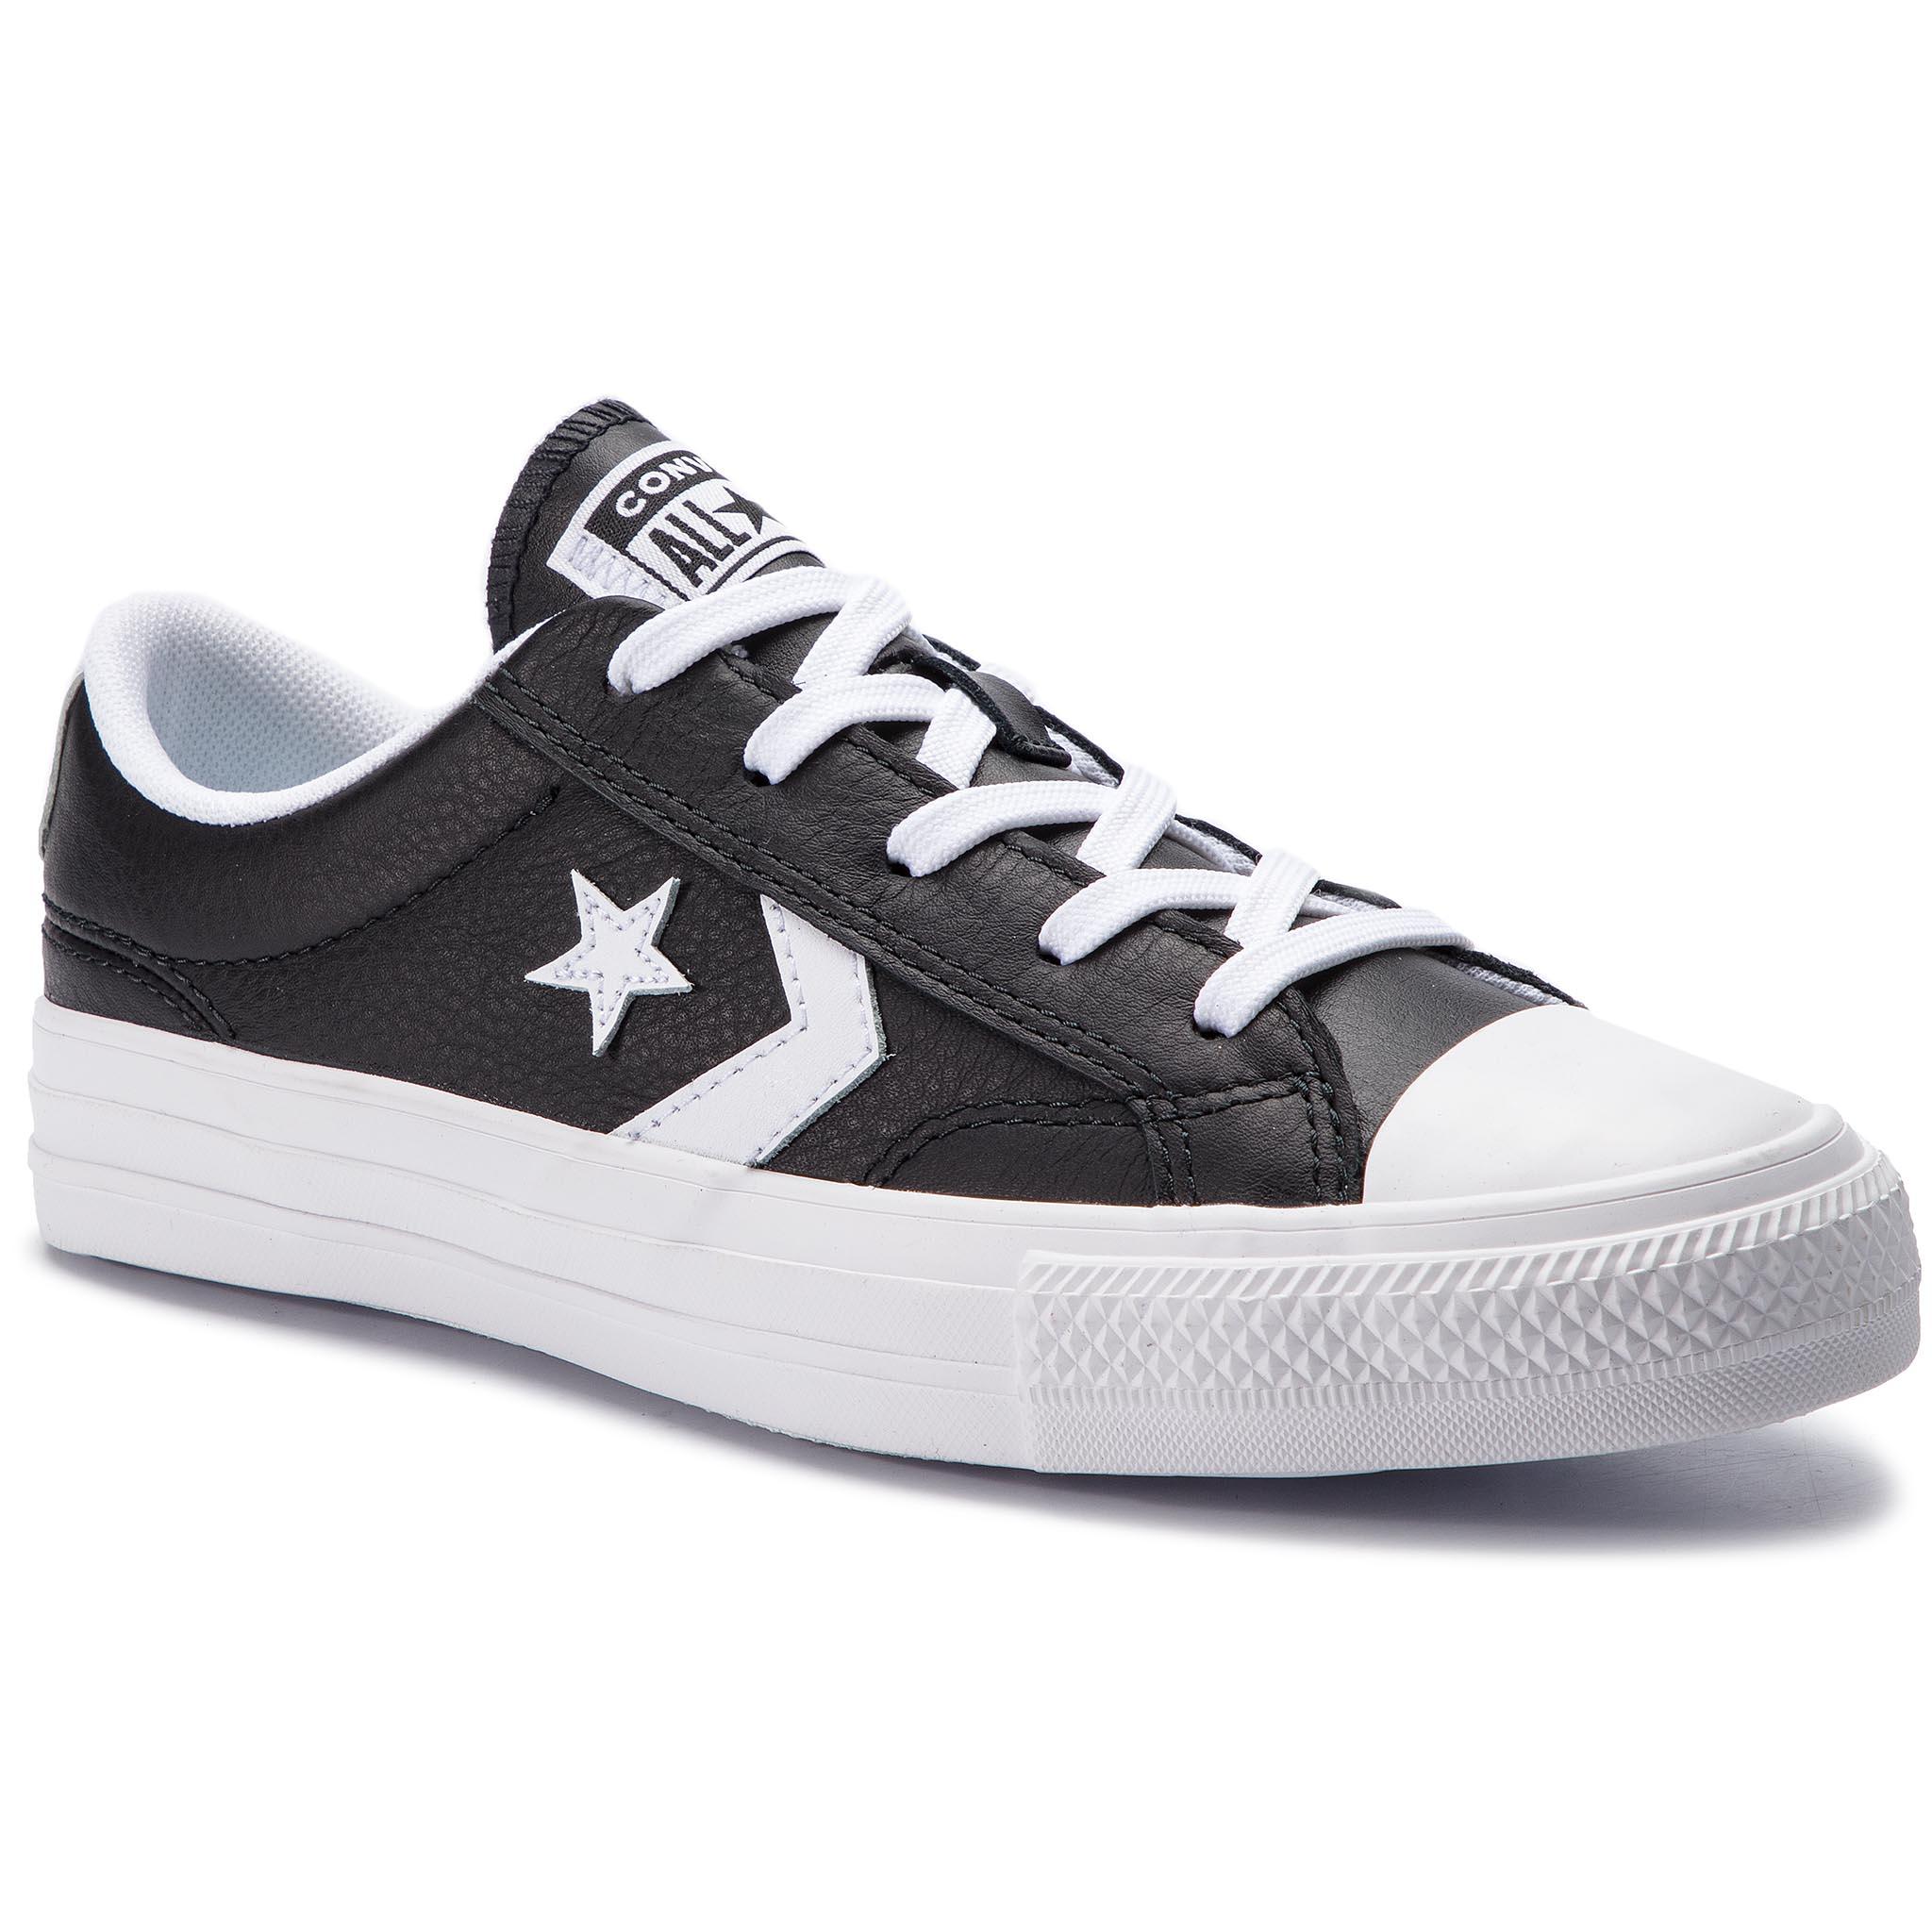 Sneakers CONVERSE Ct II Ox 150149C BlackWhiteNavy